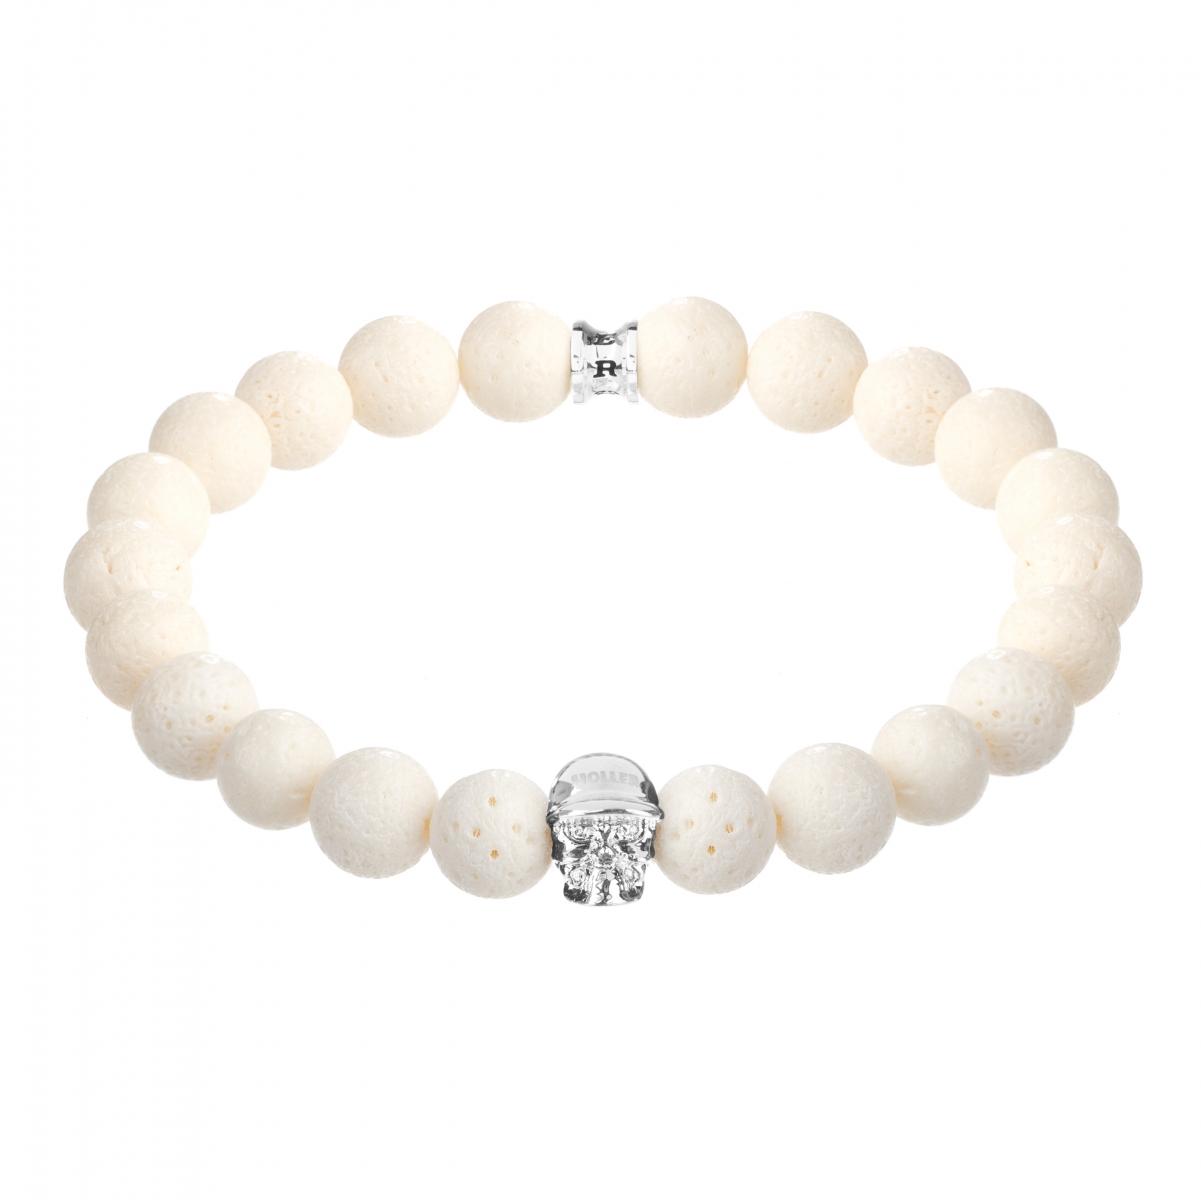 Jefferson Silver Polished Skull / 10mm White Coral Natural Stone Bracelet